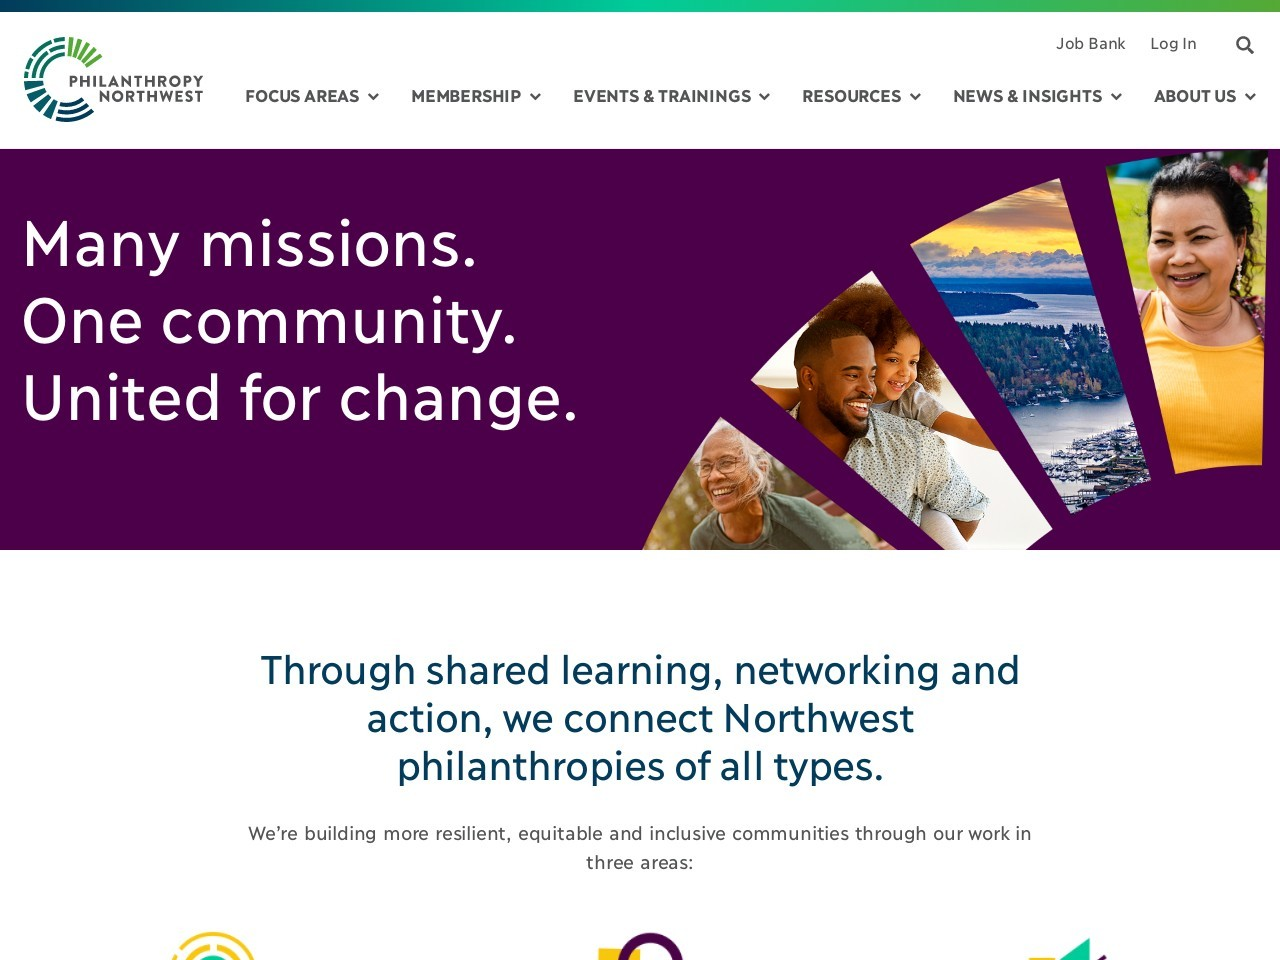 philanthropynw.org